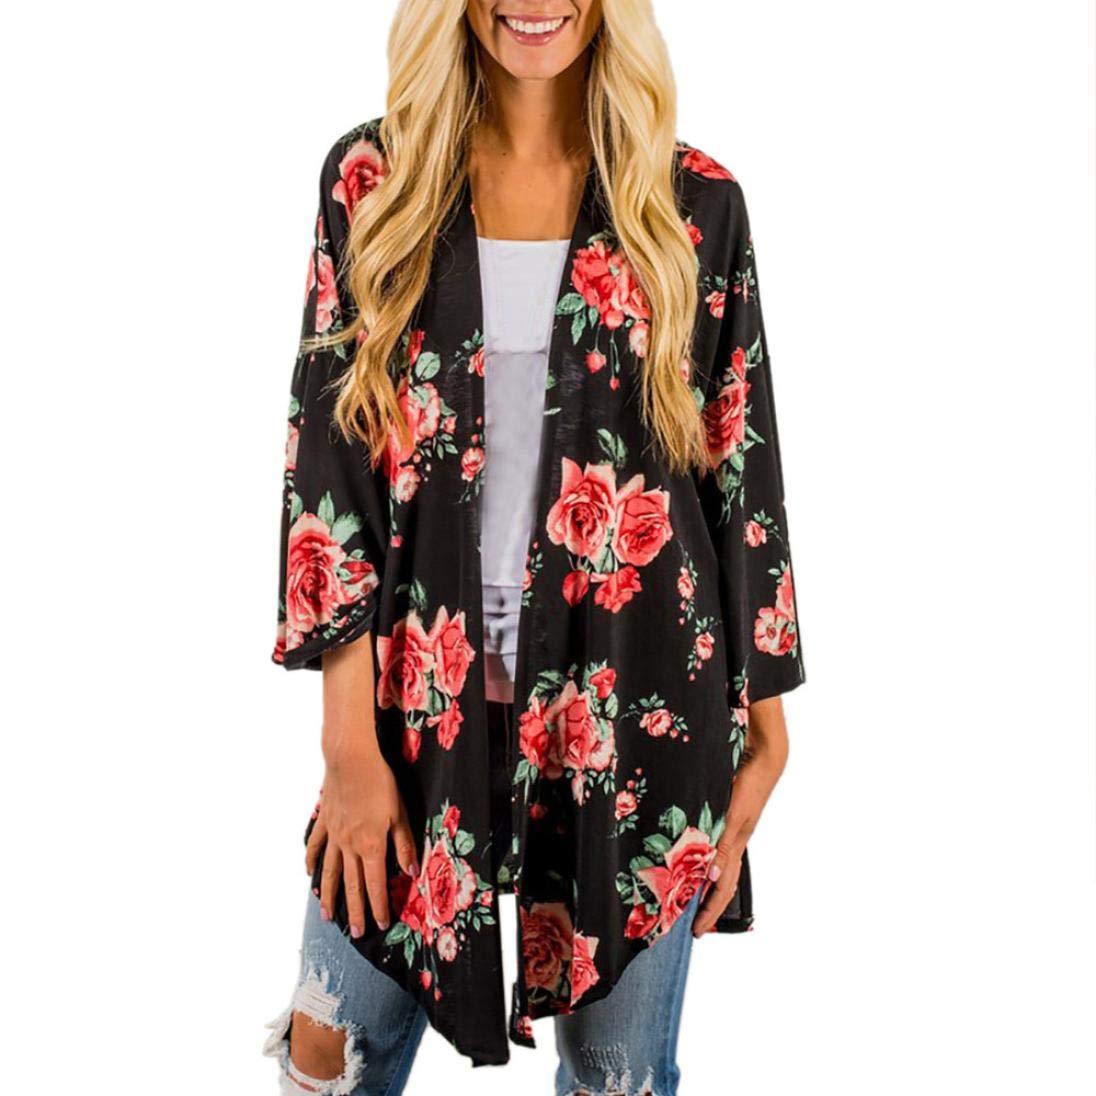 Pandaie Jacket,Feitong Womens Print Bohemia Cardigan Long Kimono Oversized Shawl Blouse BK S